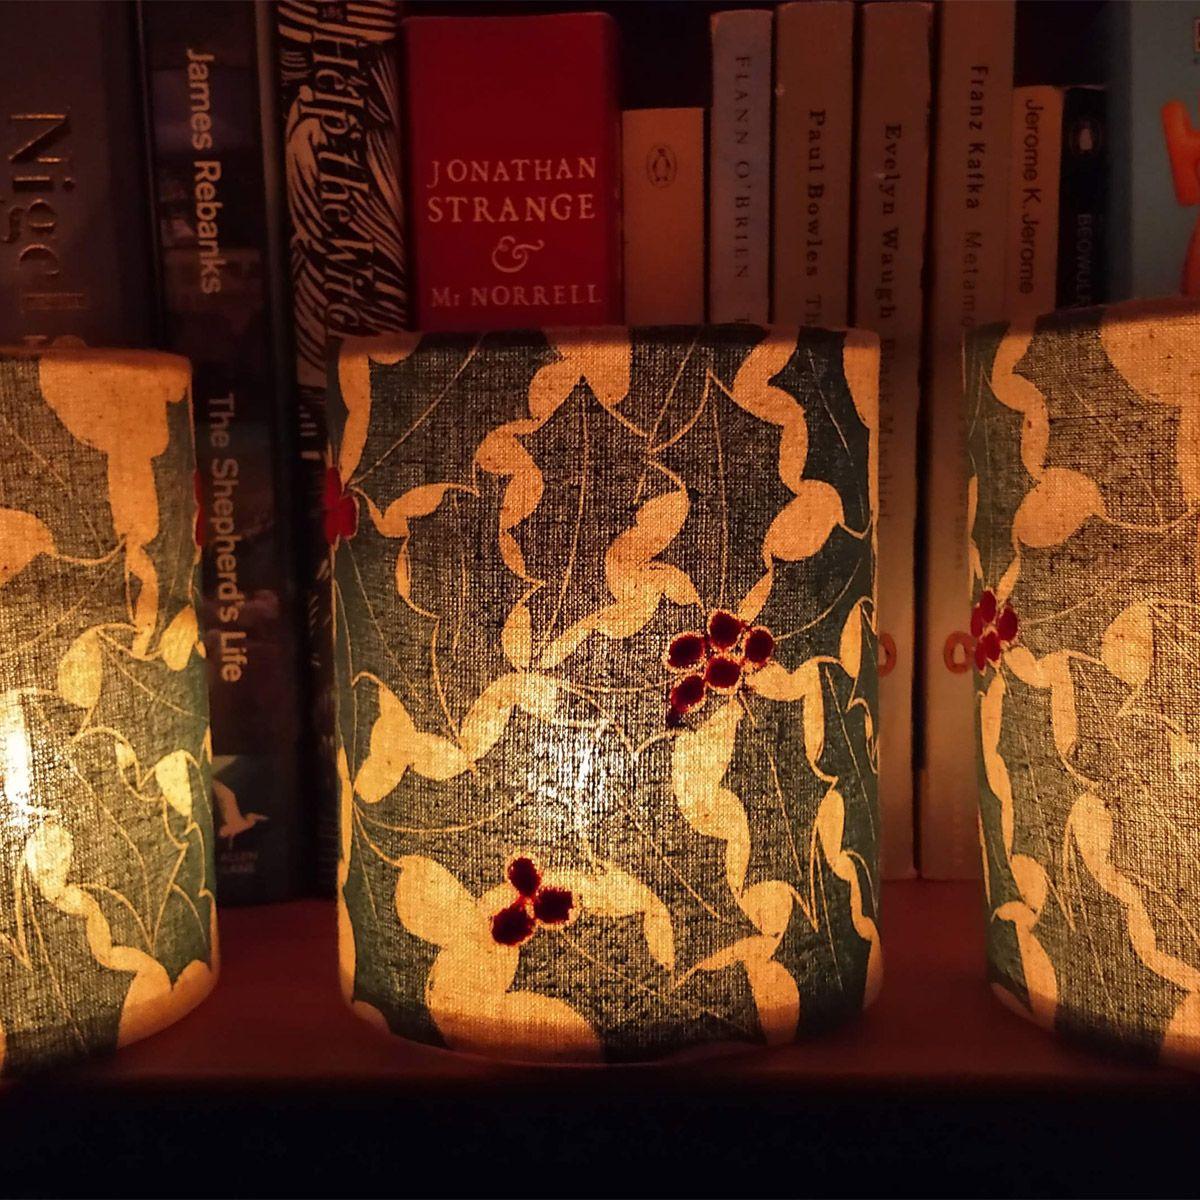 holly lanterns lit